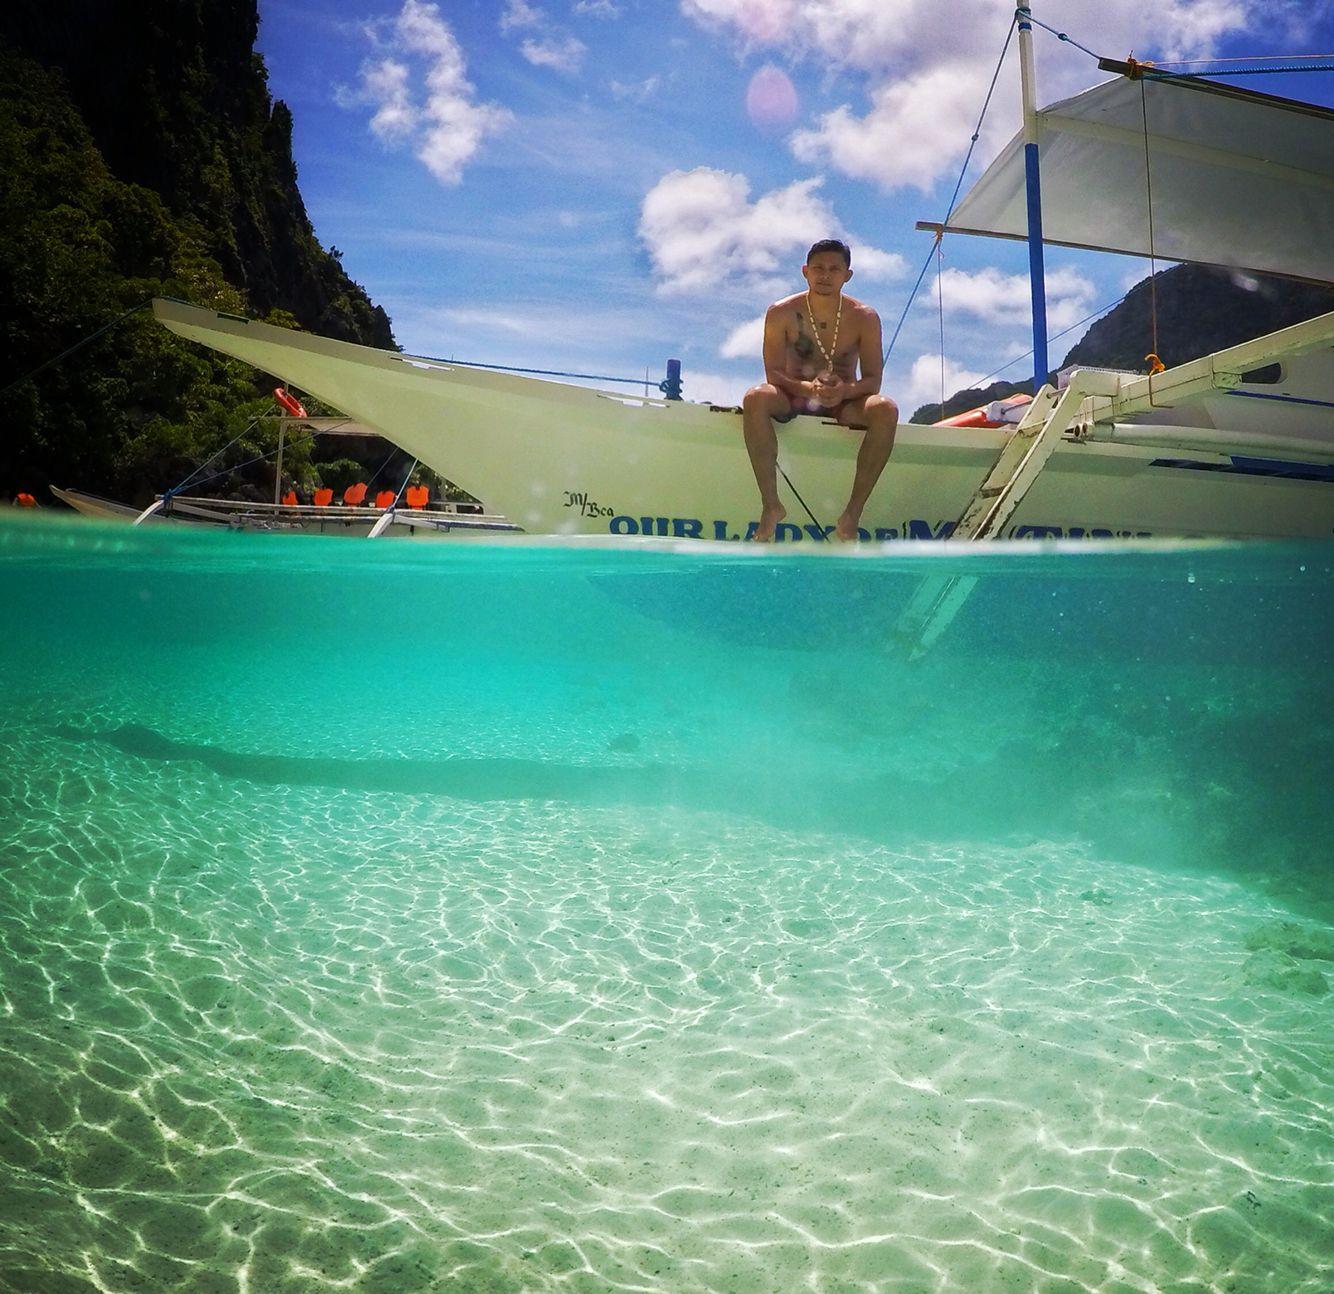 El Nido, Palawan | Beach please! | Pinterest | El nido and Palawan